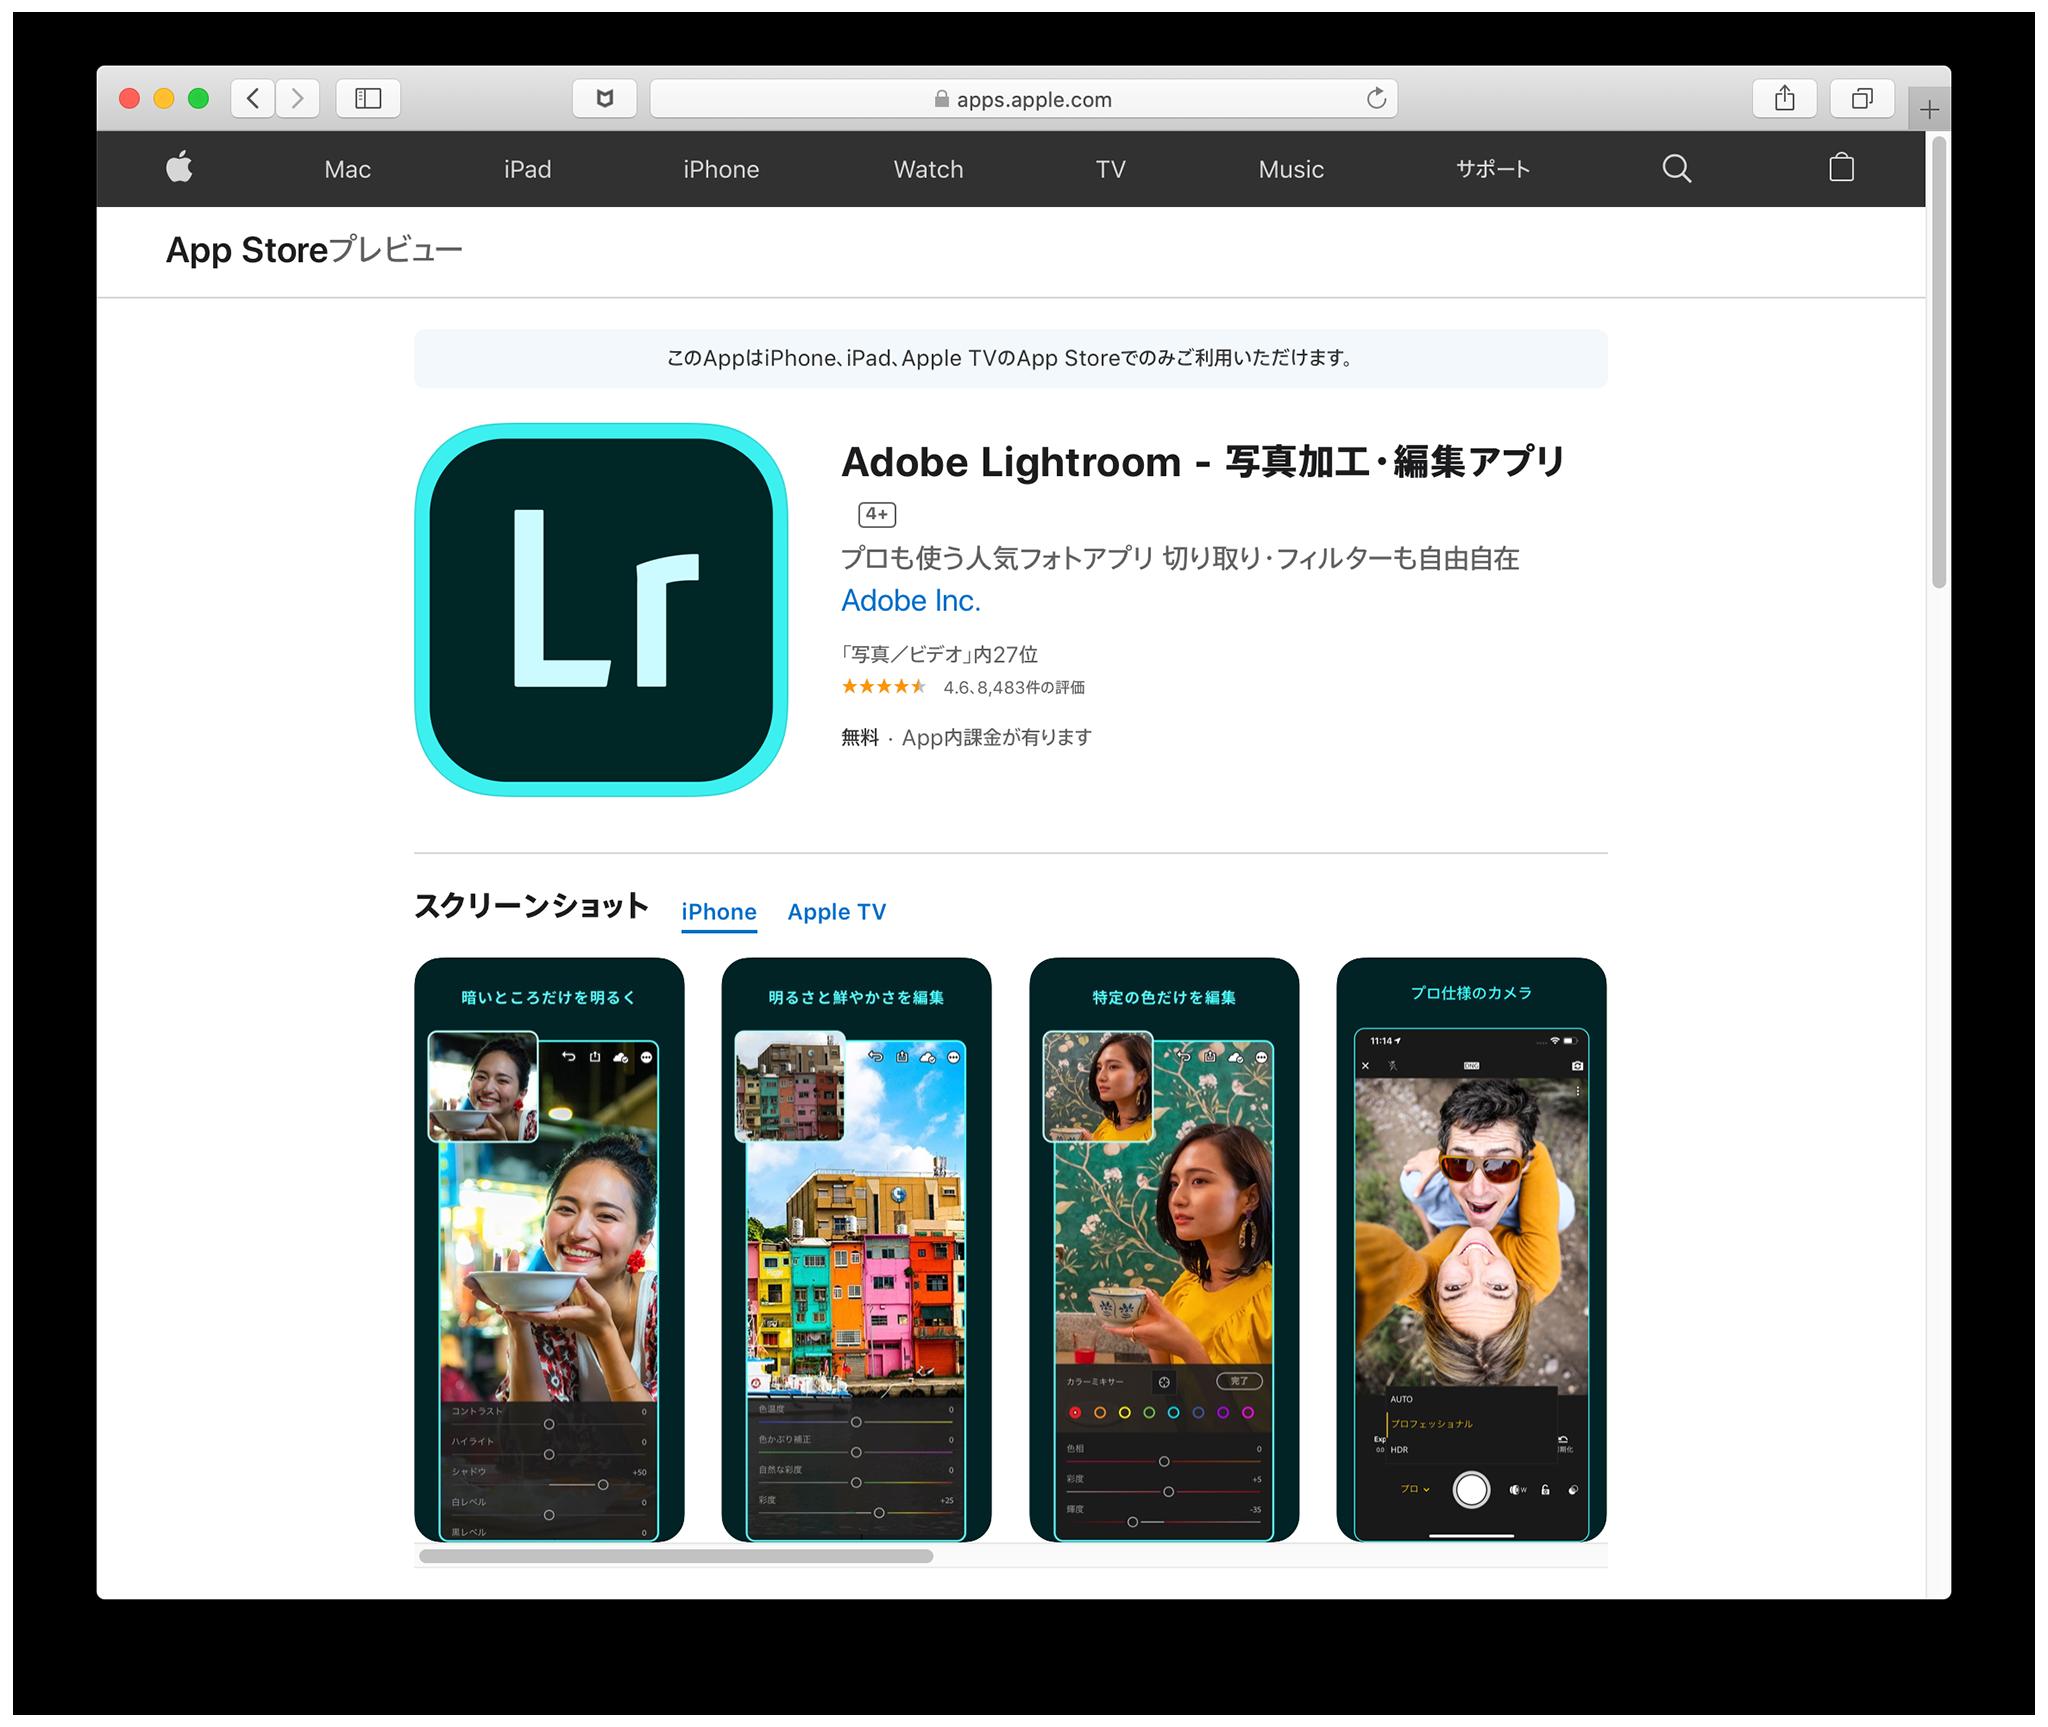 Adobe Lightroom - 写真加工・編集アプリ